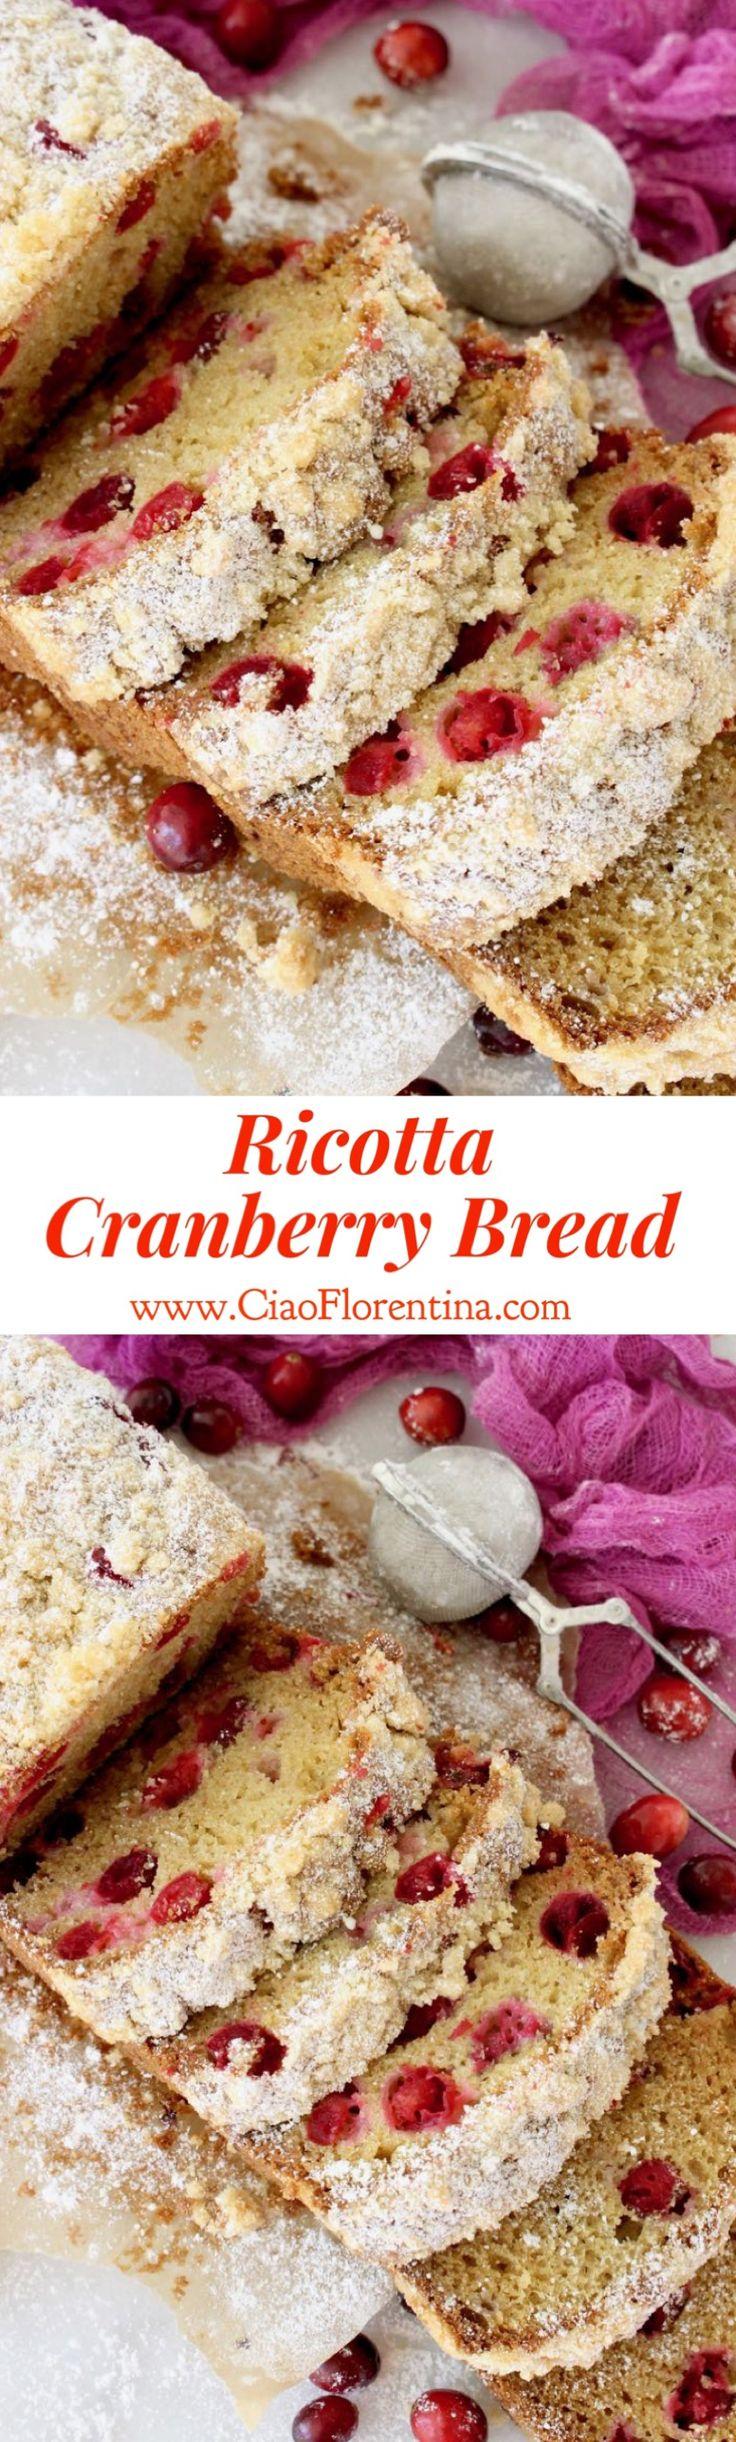 Cranberry Bread Recipe with Ricotta and Olive Oil | CiaoFlorentina.com @CiaoFlorentina